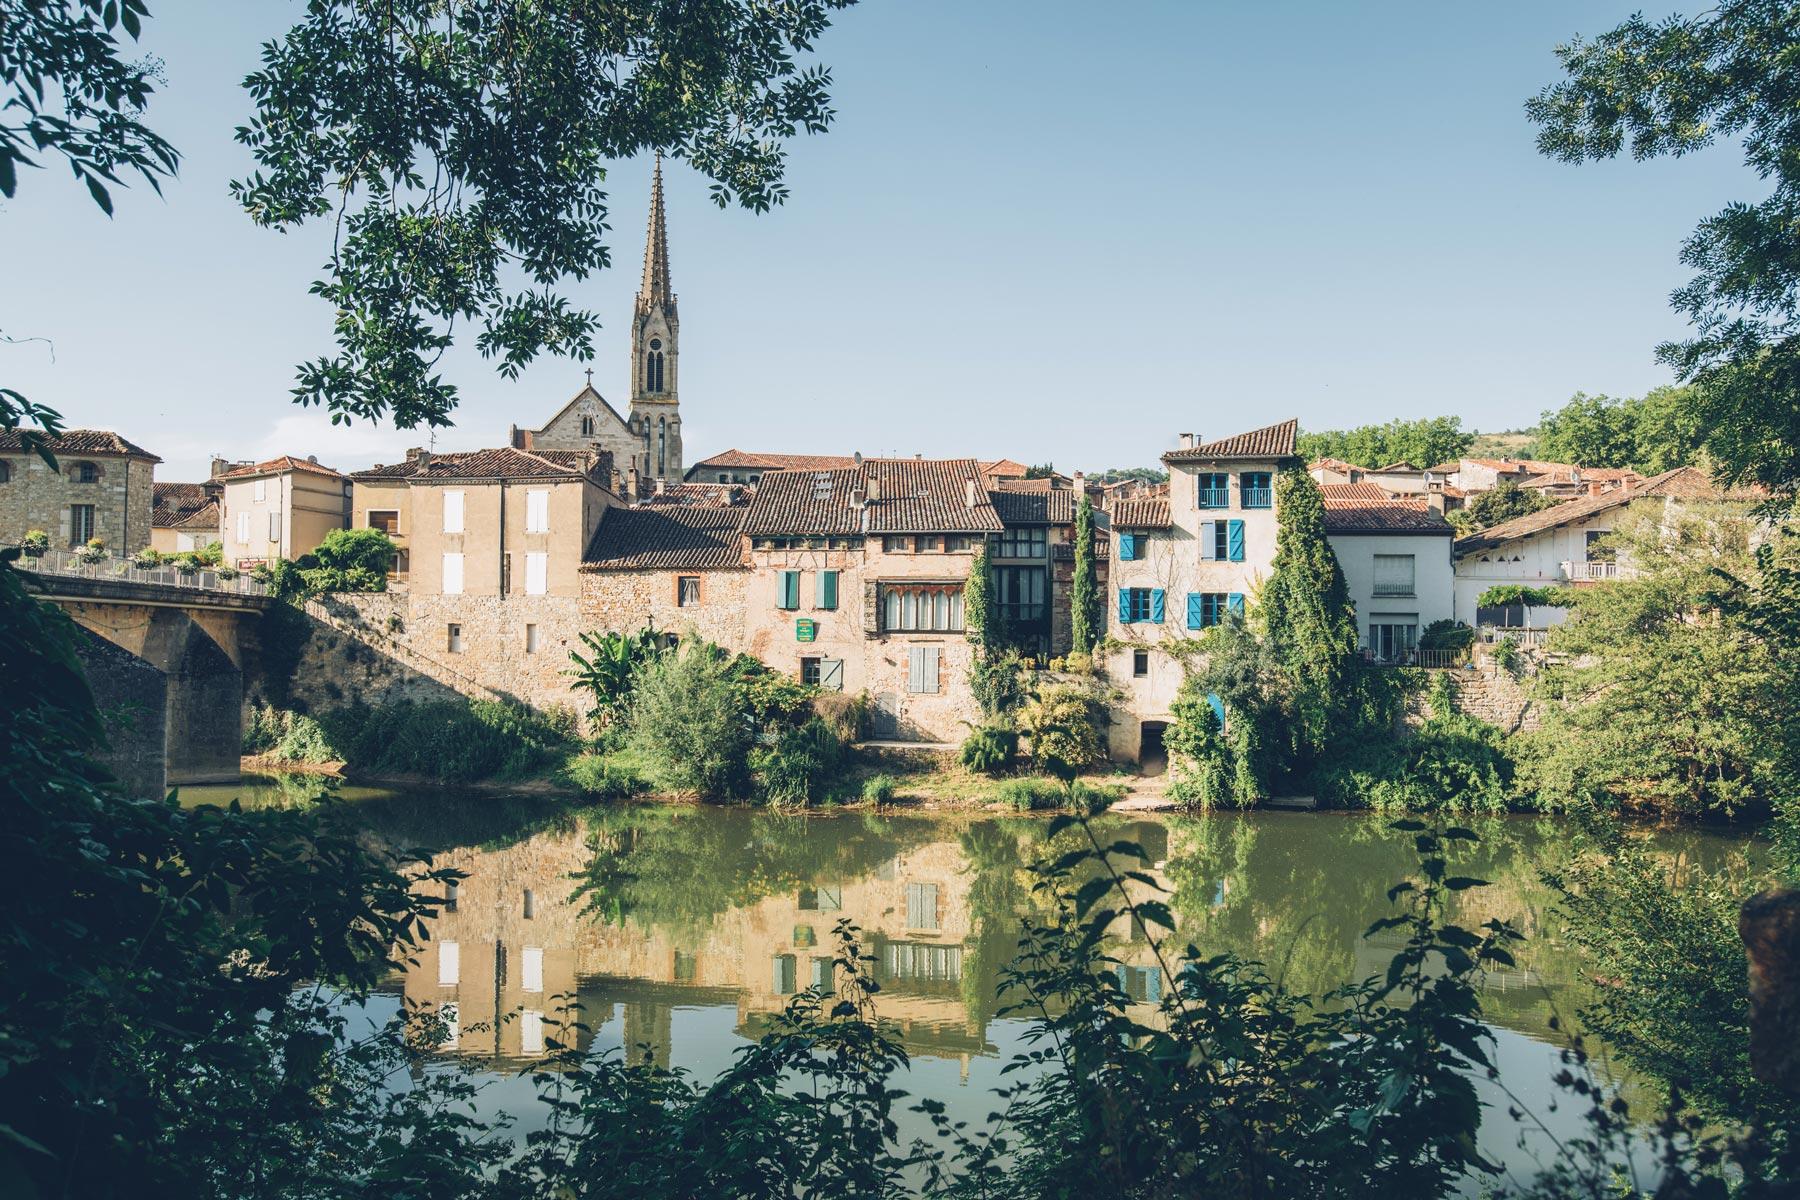 St Antonin, Tarn et Garonne